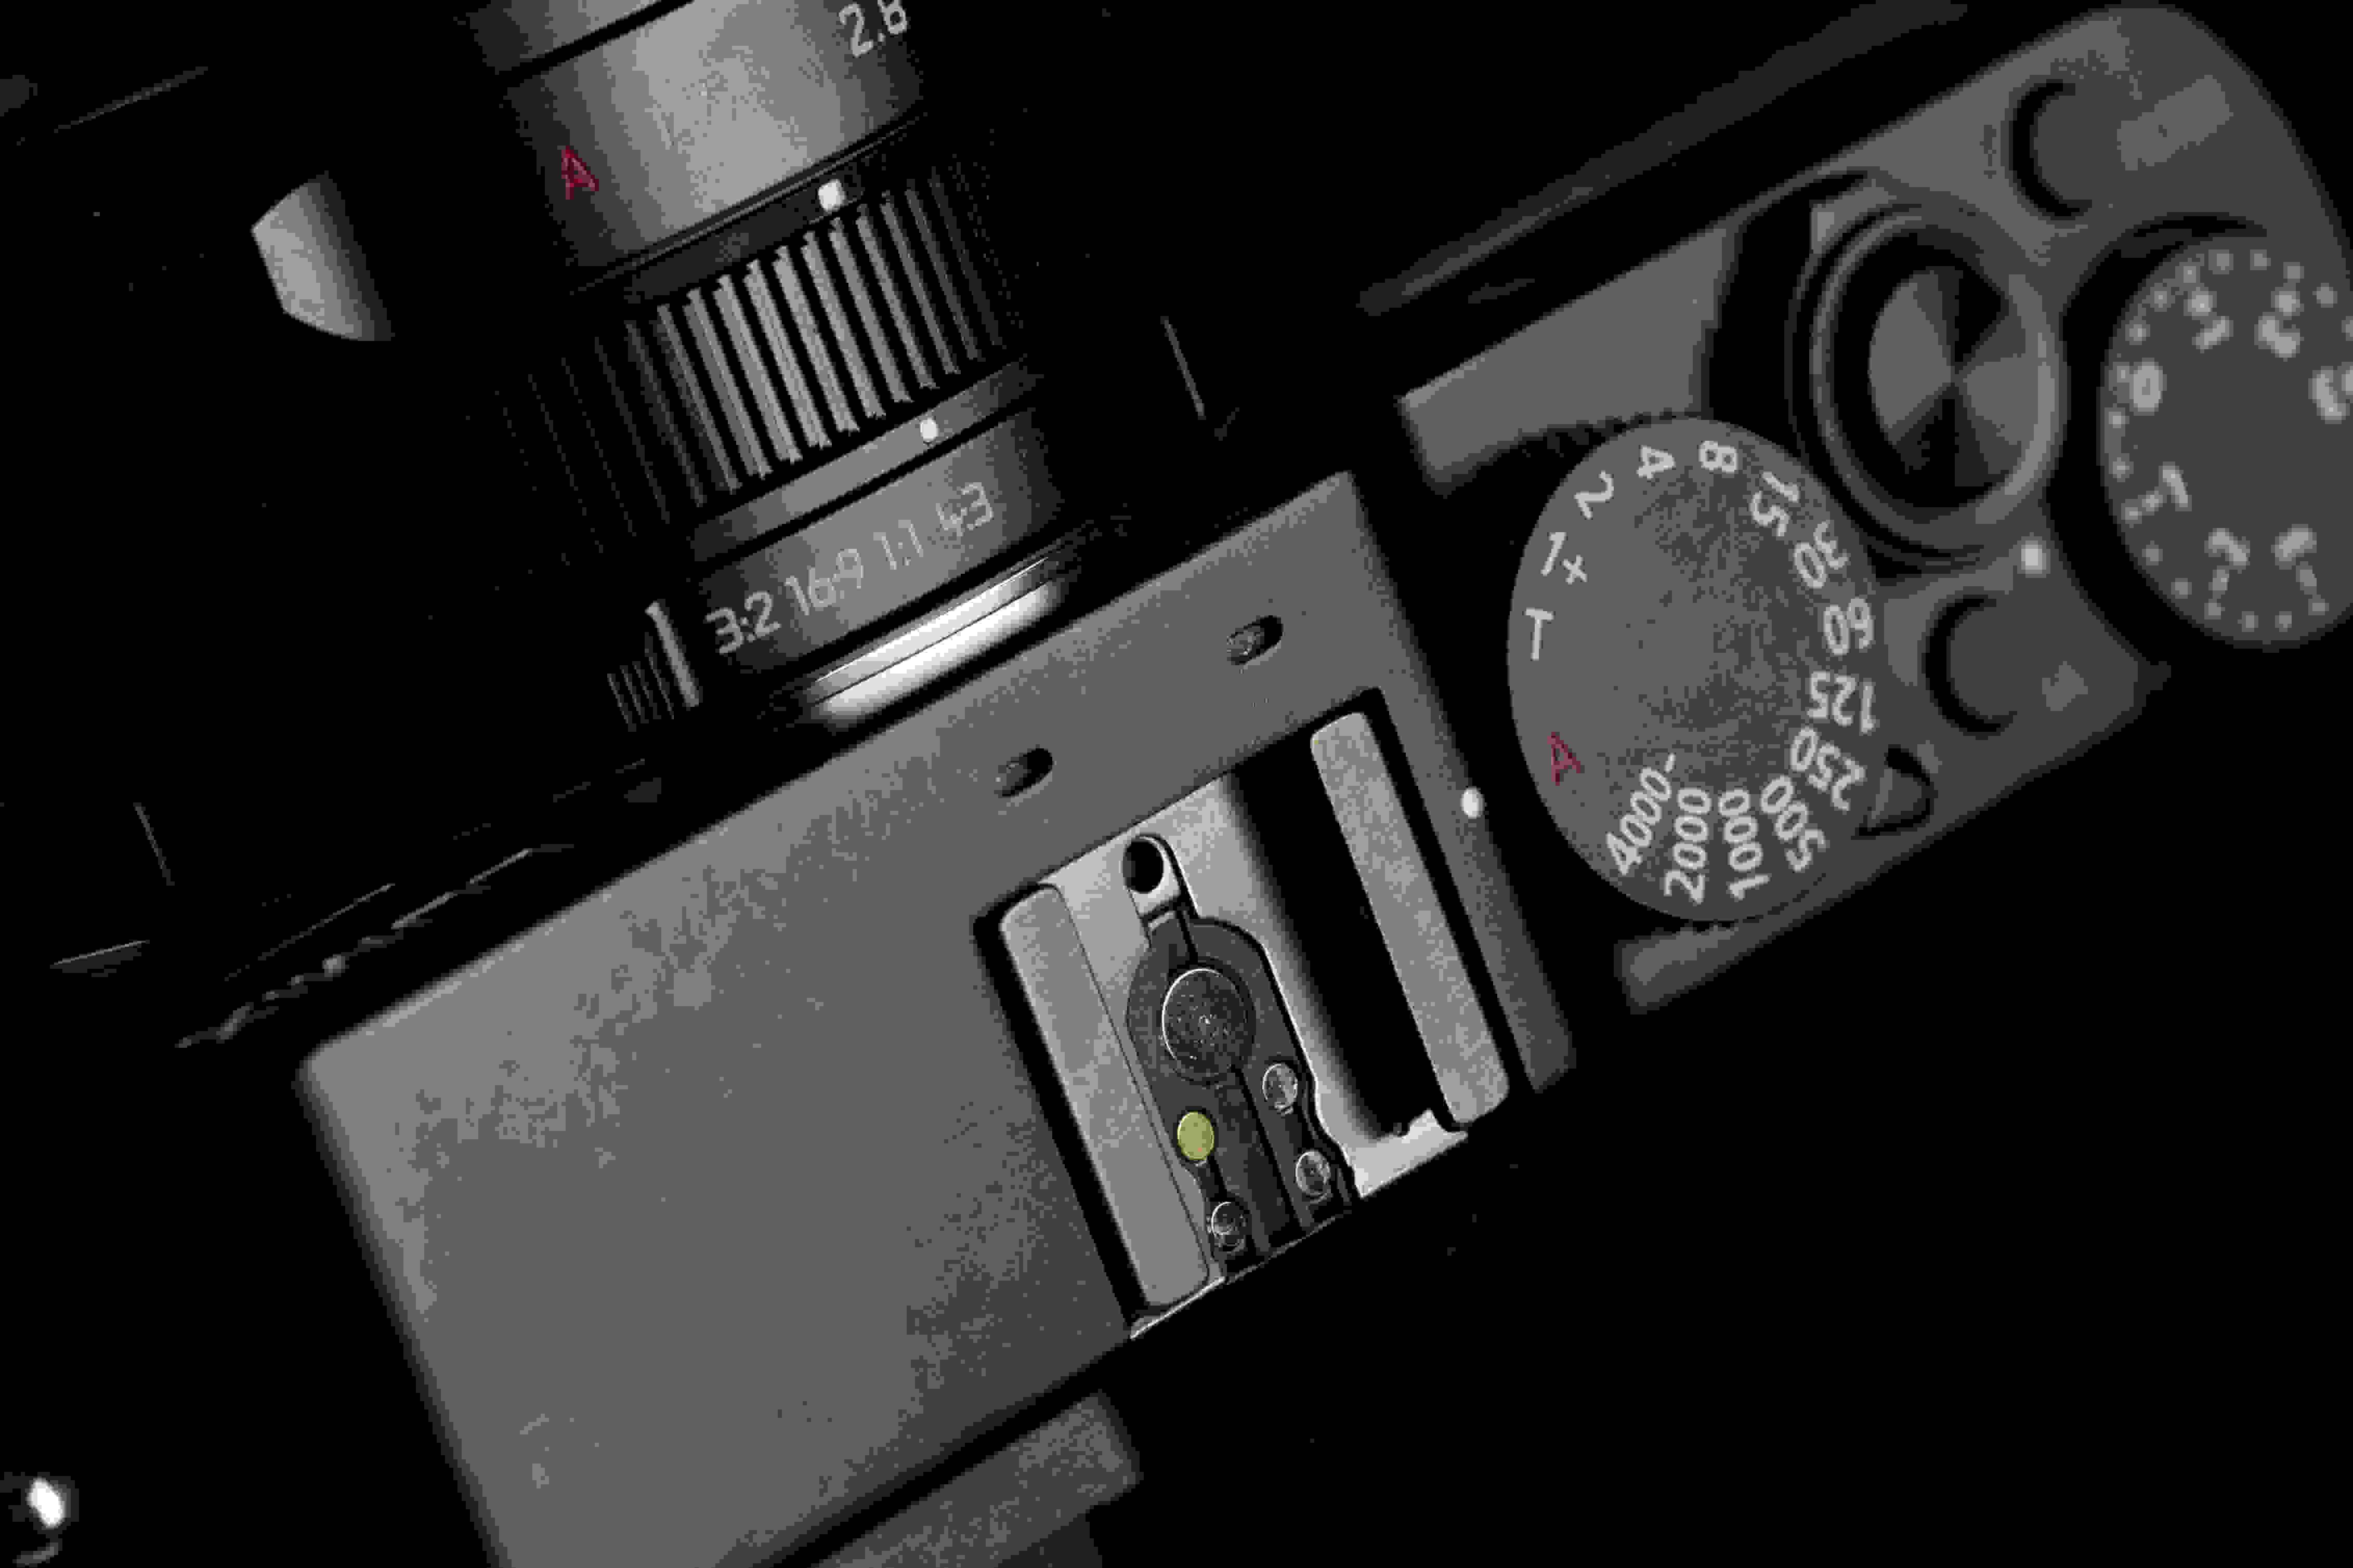 A photograph of the Panasonic Lumix LX100's hot shoe.